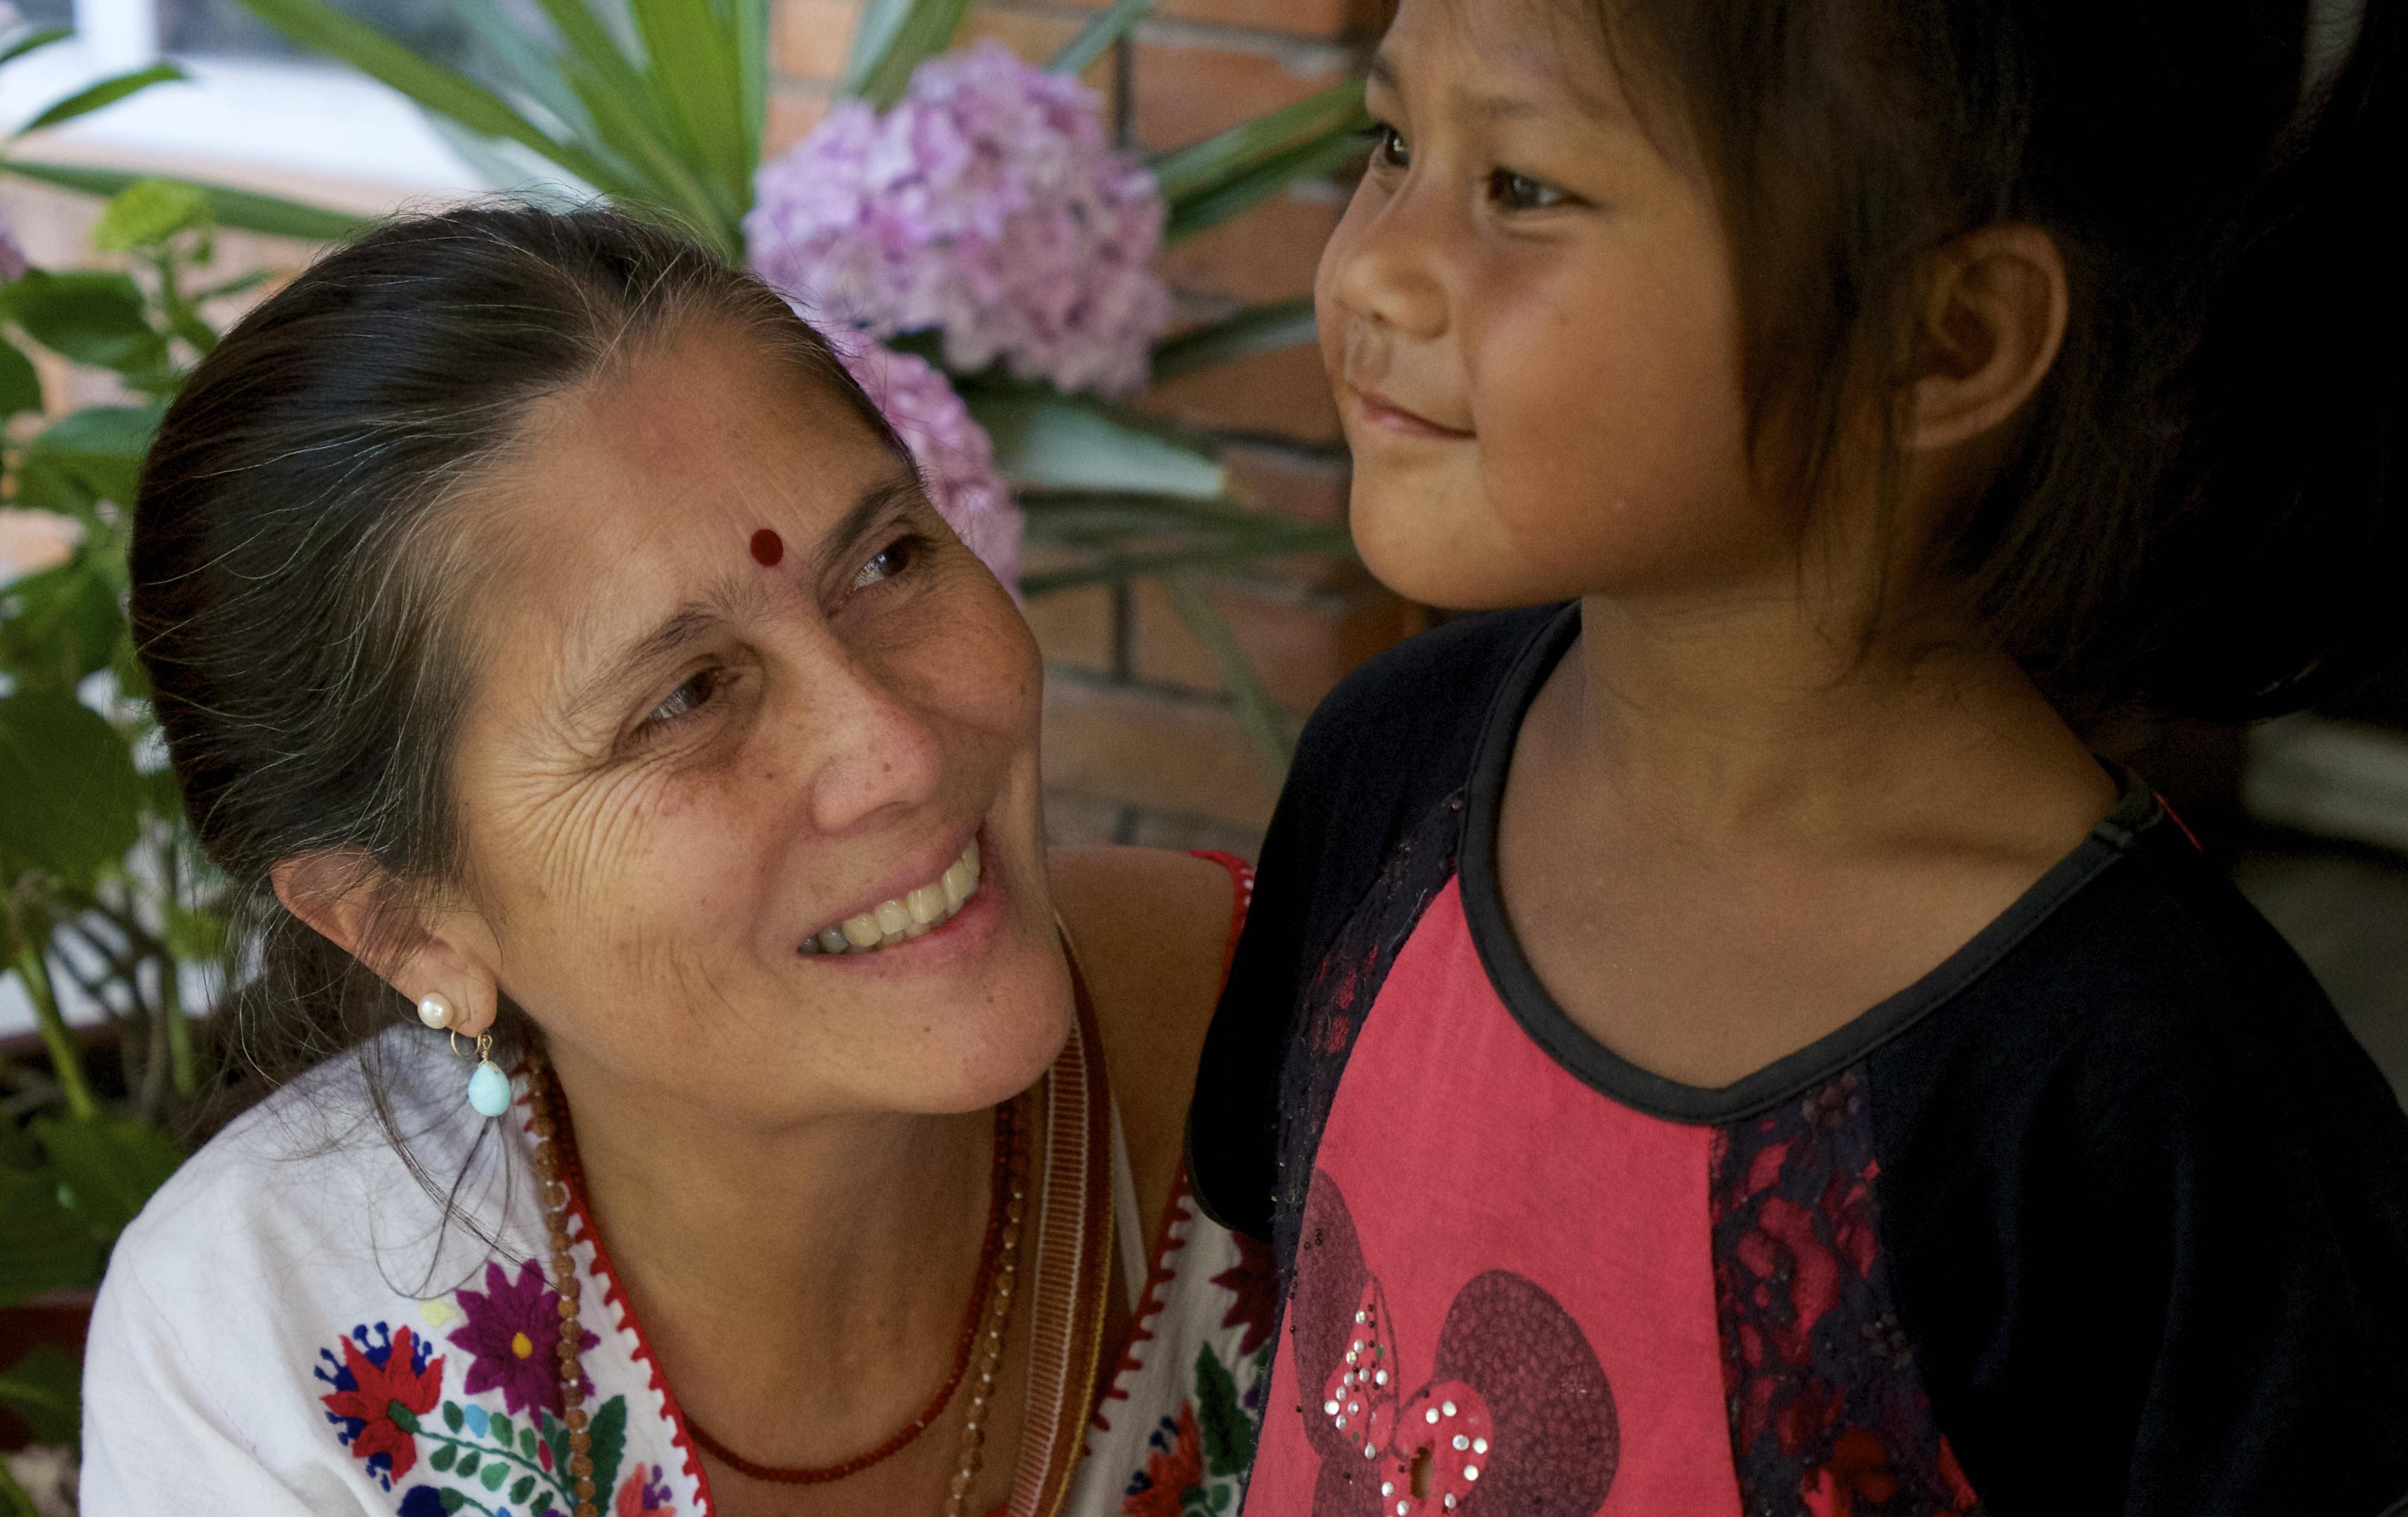 Earth Companyでは毎年一人を「インパクト・ヒーロー」に選出、1,000万円以上のファンドレイジングなど、3年間を通じて支援する。2016年に選ばれたブミセハット国際助産院代表のロビン・リムは、「現代のマザー・テレサ」とも呼ばれる助産師。インドネシア、フィリピンや世界各地の被災地で 貧困、紛争、災害などの理由で医療を受けられない妊産婦・一般患者に対し365日、24時間、無条件に、医療ケアを無償提供する。